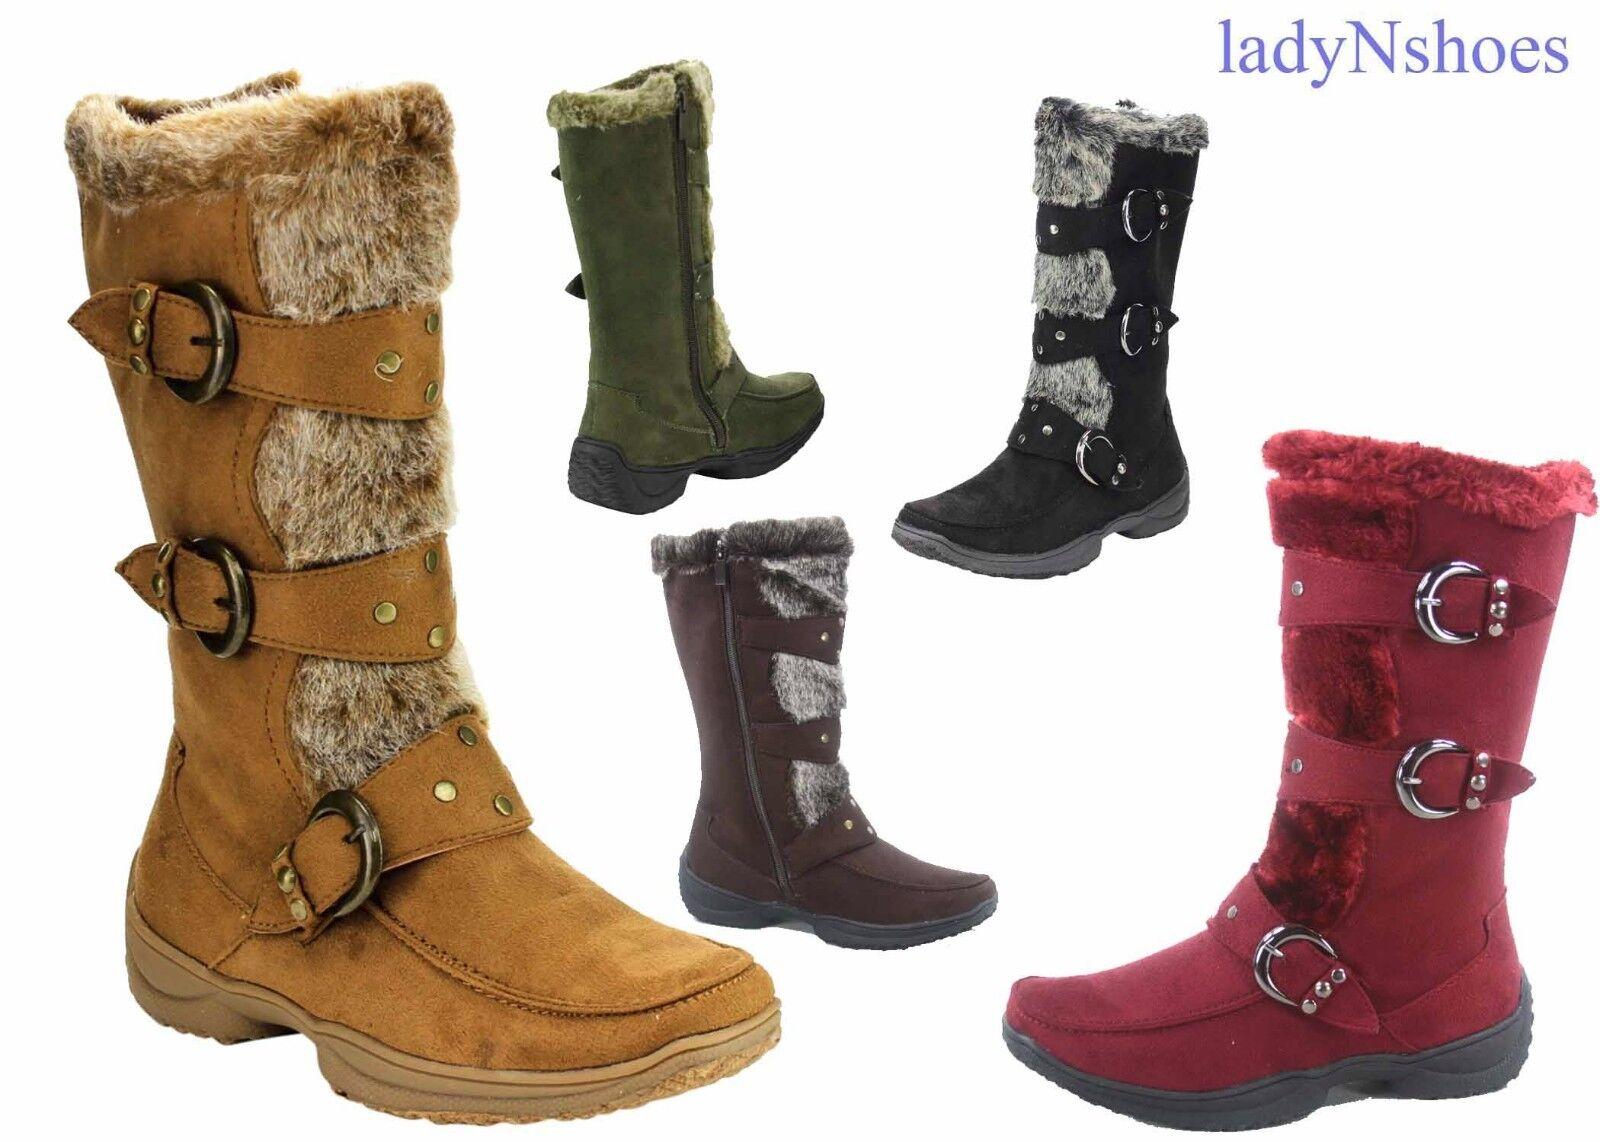 Boots - NEW Women's Winter Low Flat Heel Zipper Buckle Strap Mid-Calf Boots Size 5.5 -10